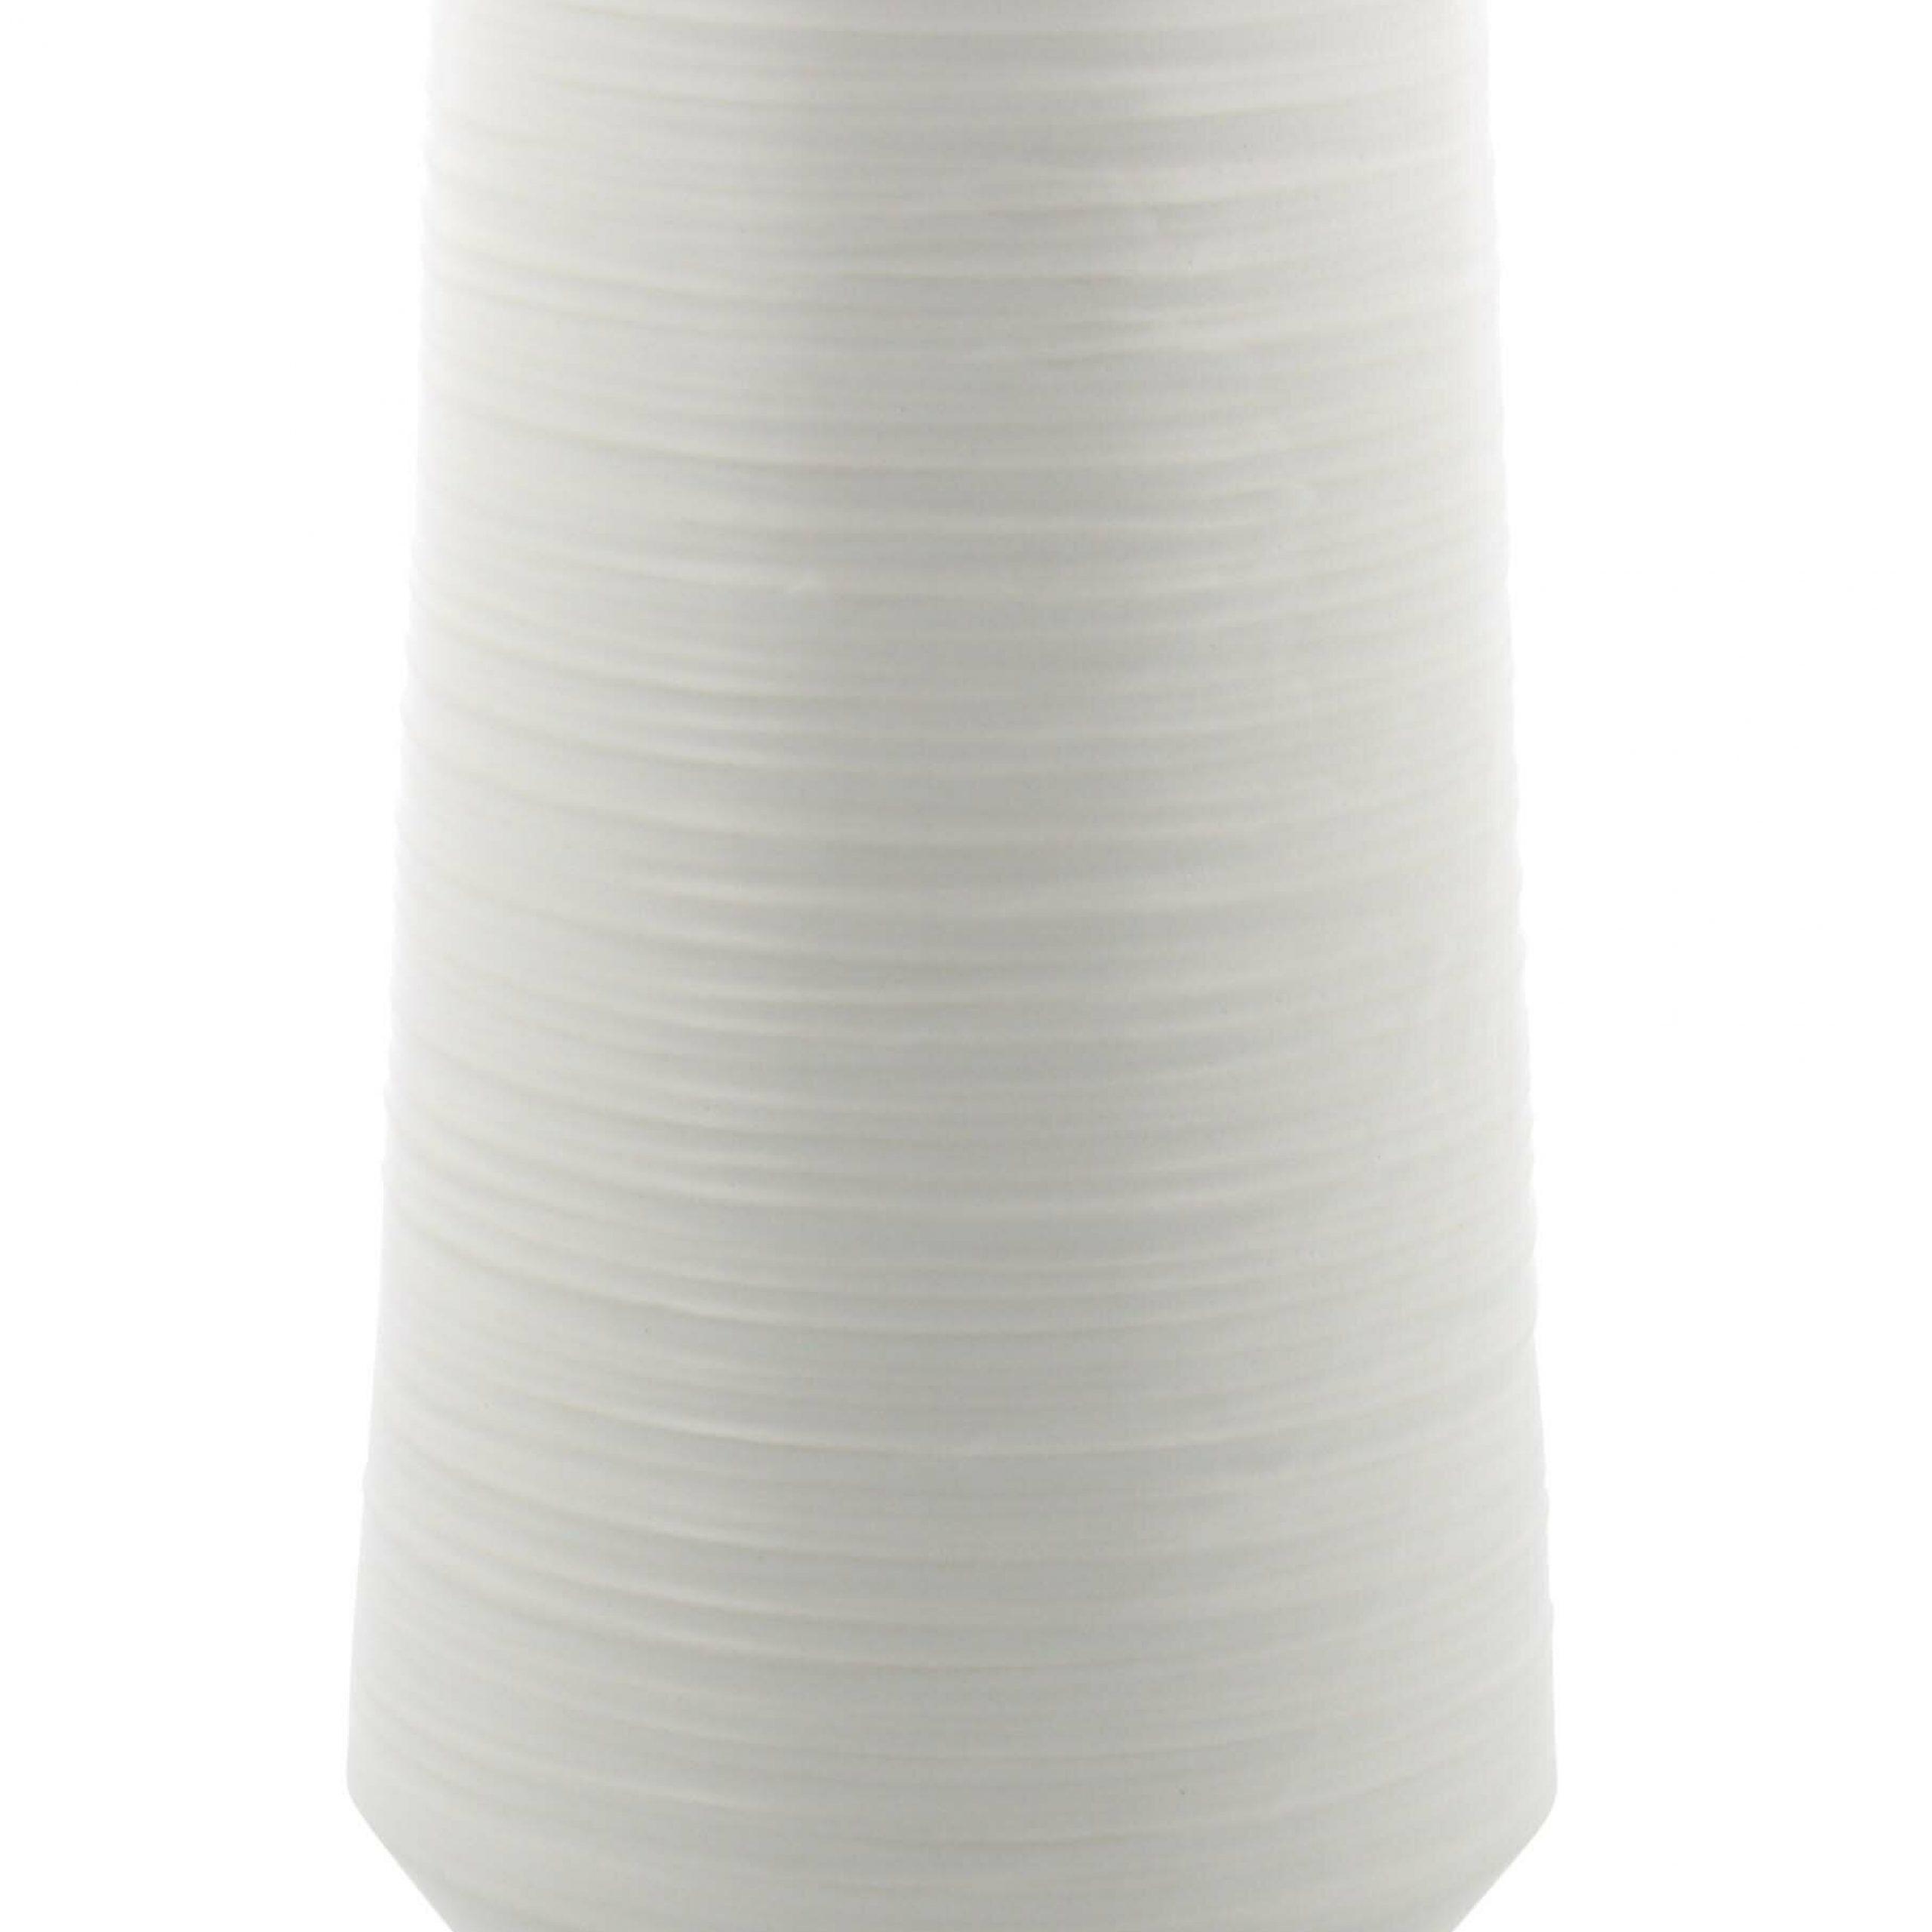 Kingsland Matte Porcelain Pear Shaped Table Vase For Aloysius Ceramic Garden Stools (View 22 of 25)